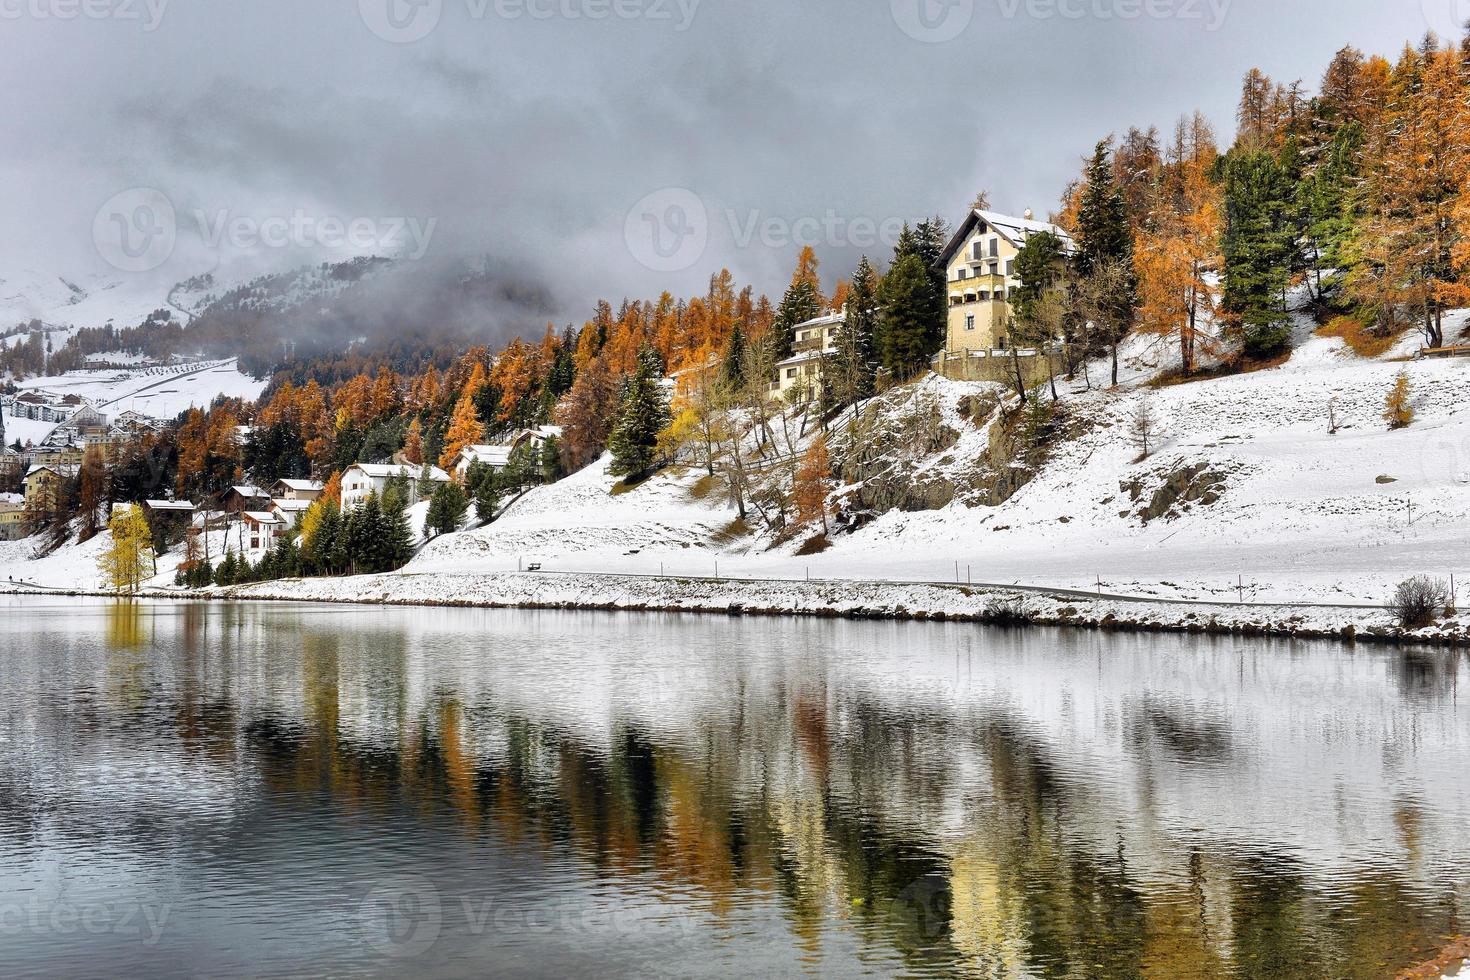 Lake St. inverno moritz foto